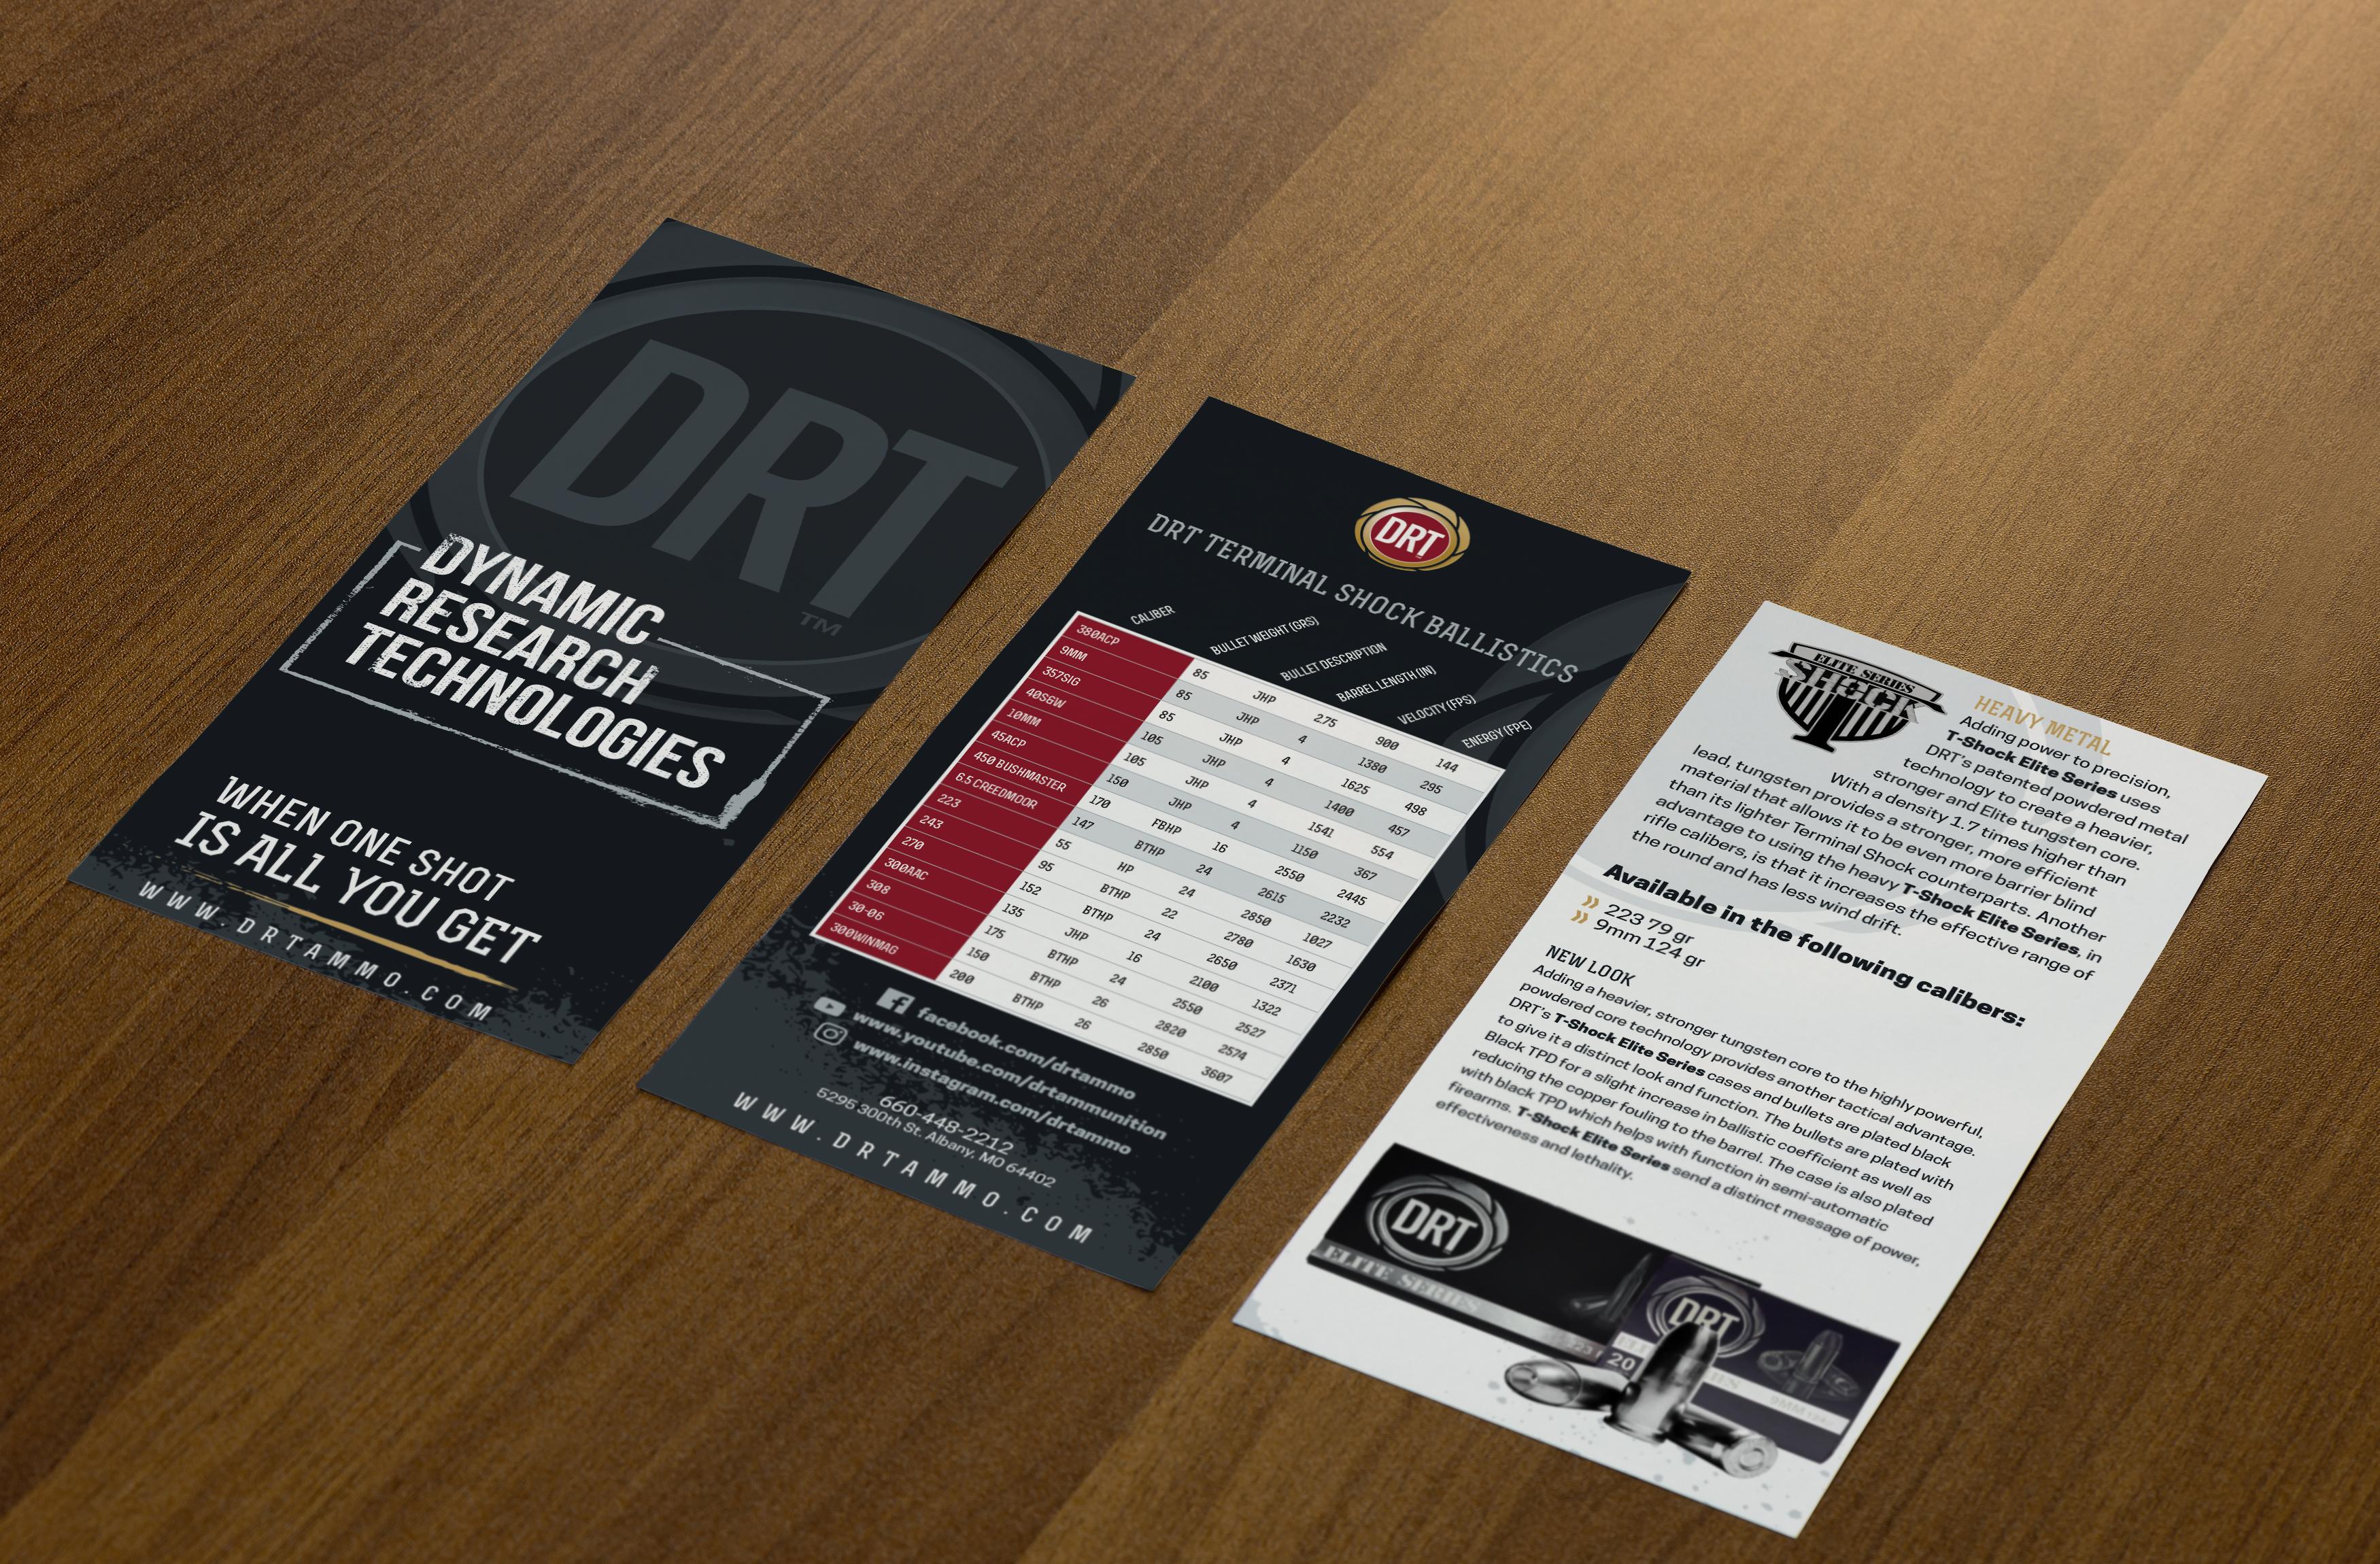 DRT ammunition tri-fold brochure: outside